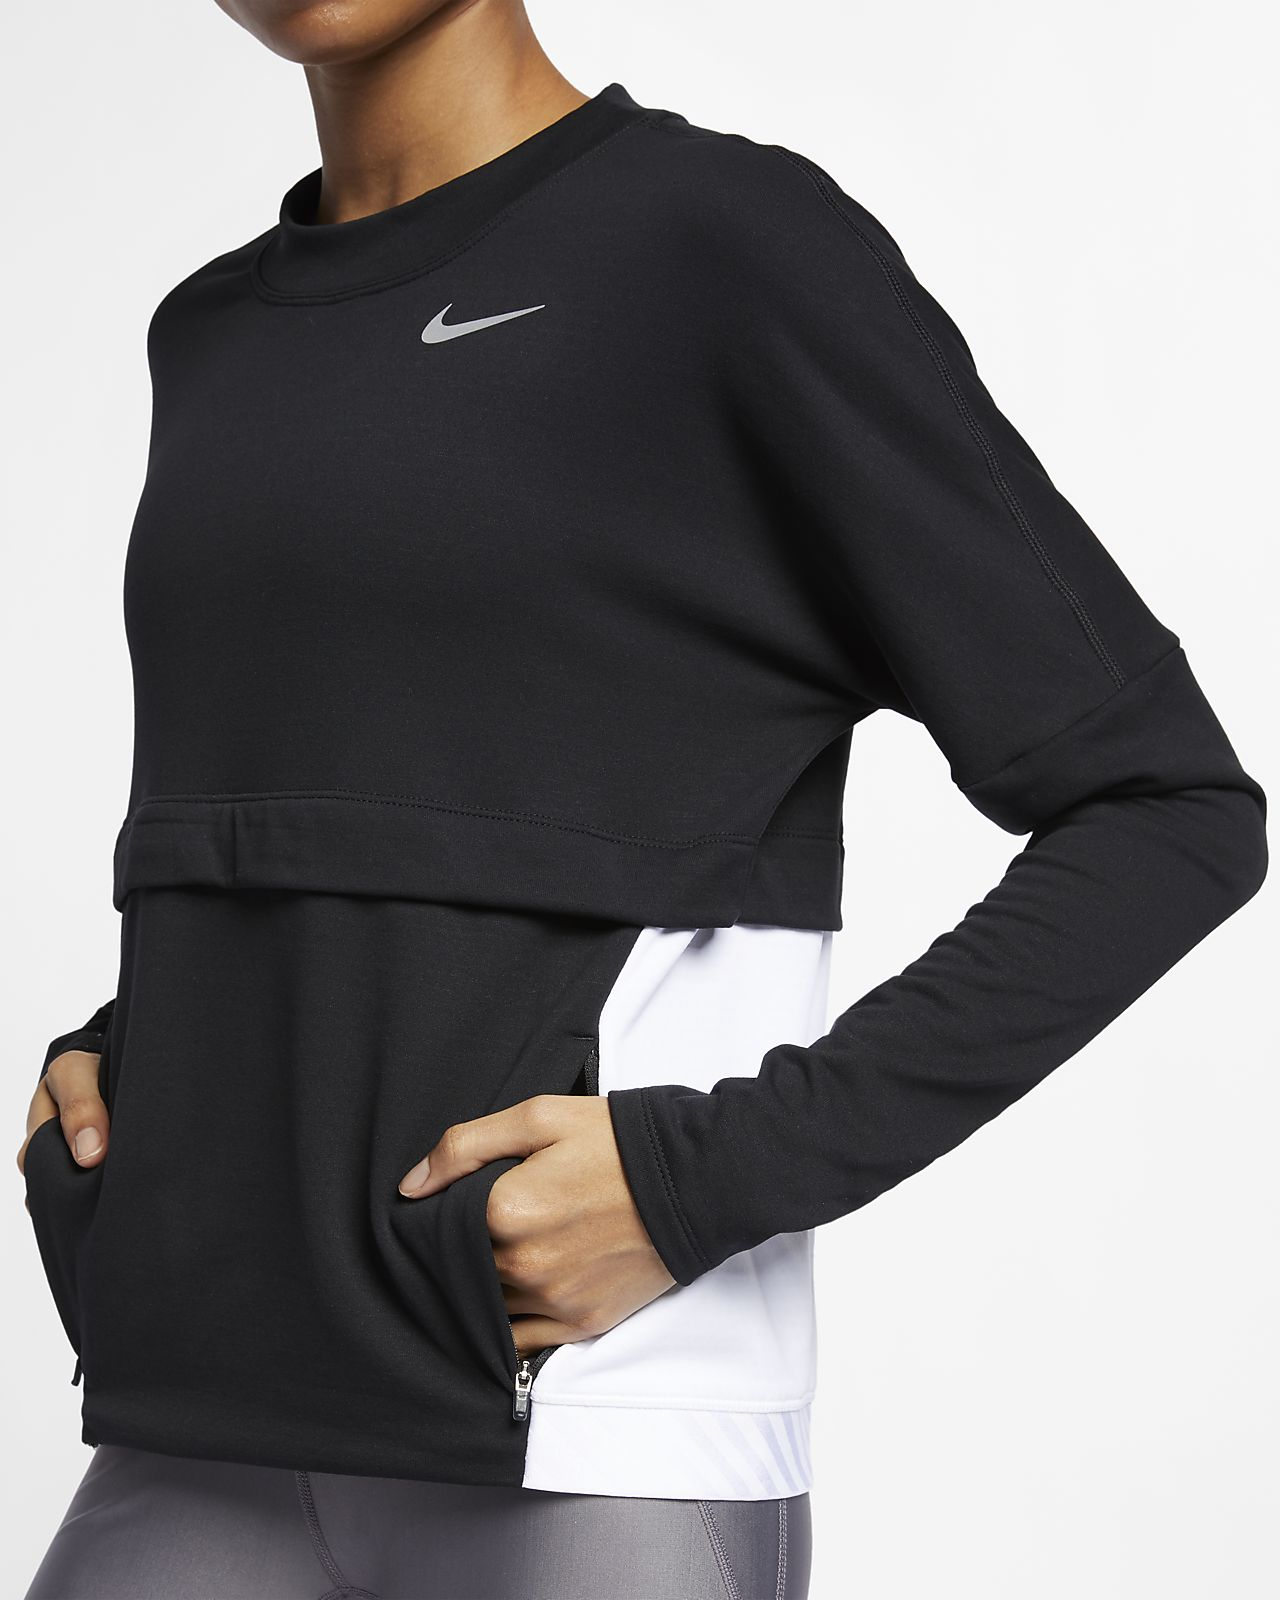 Haut de running Nike Therma Sphere pour Femme